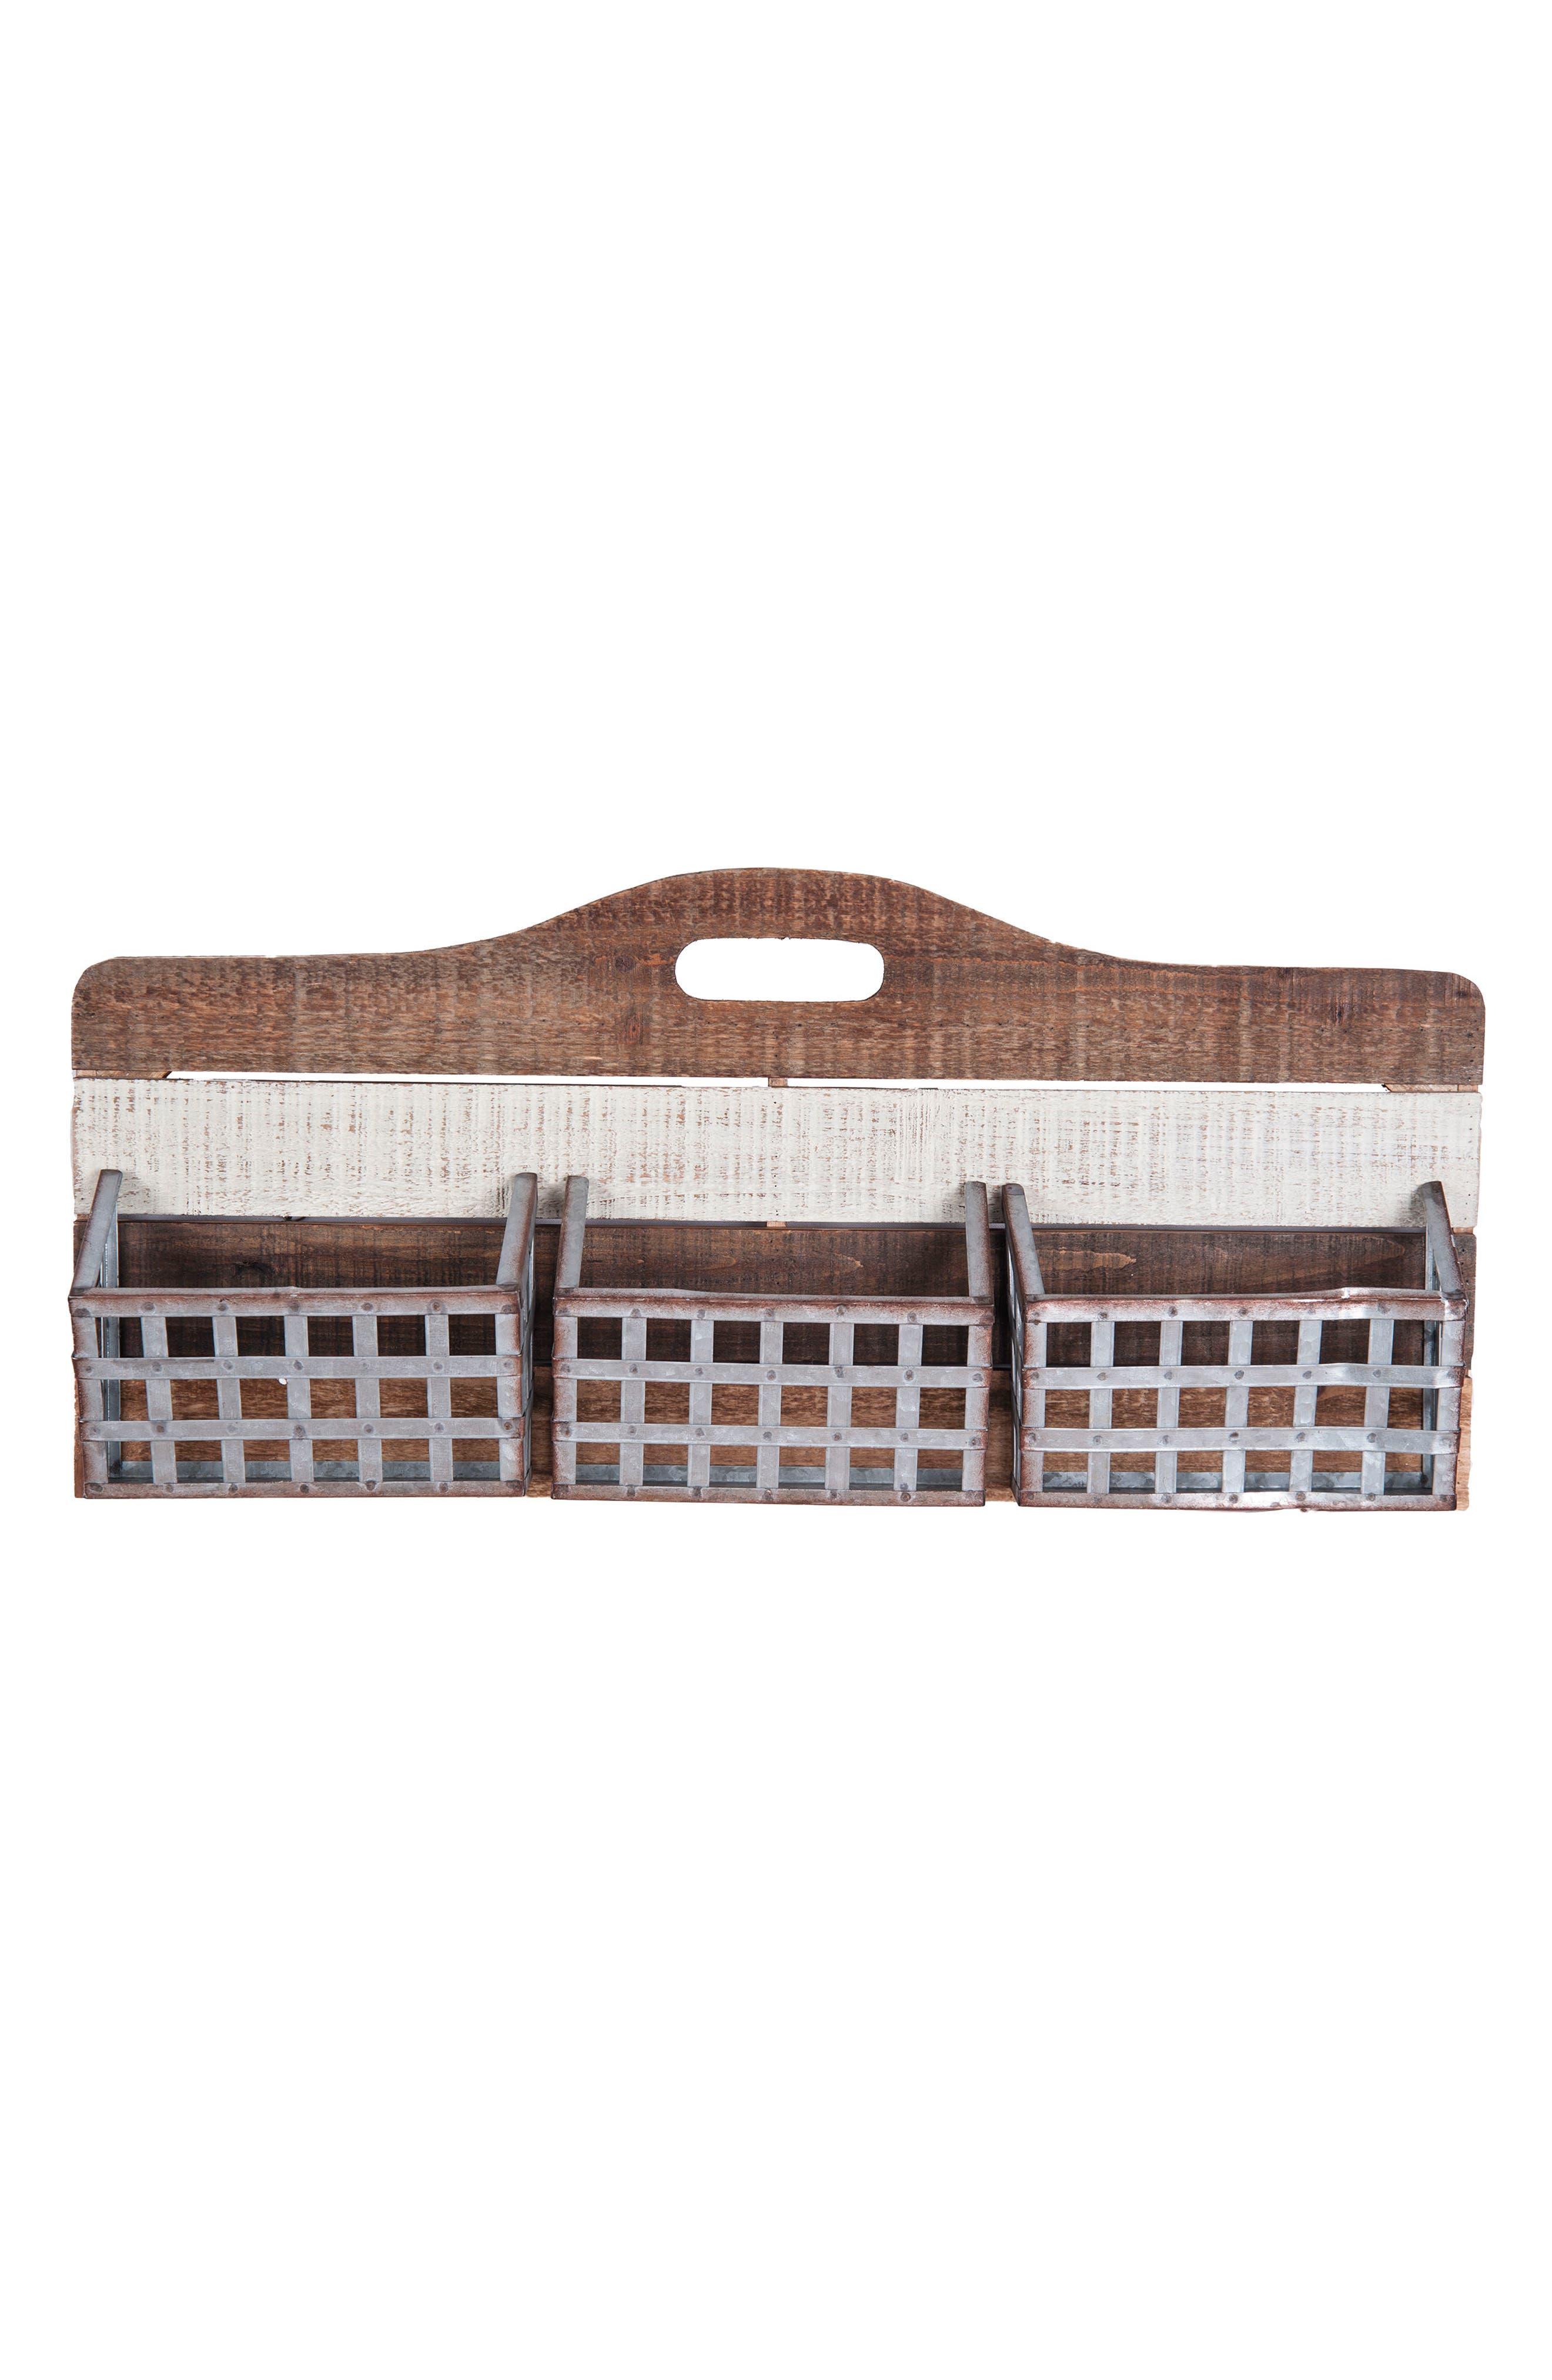 Basket Wall Art,                         Main,                         color, Wood/ Metal